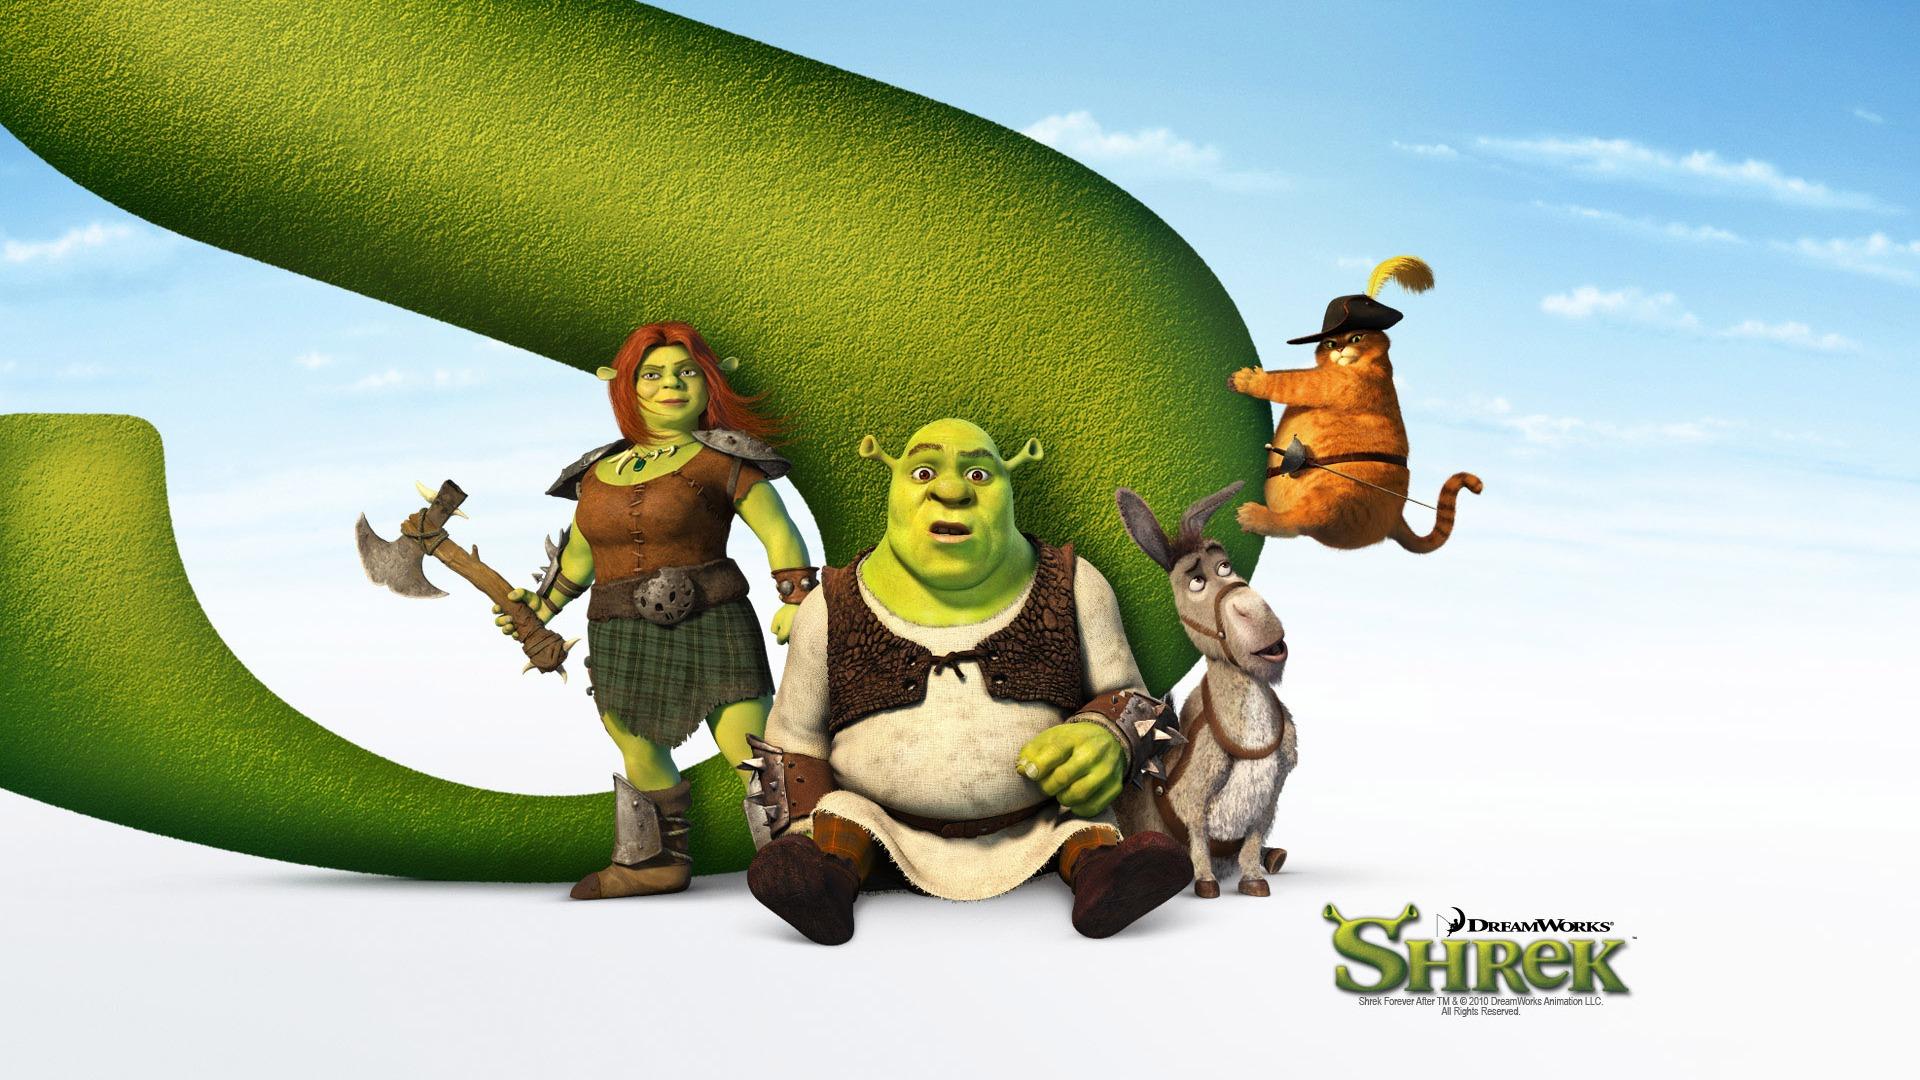 Shrek Forever After HD wallpaper #16 - 1920x1080 Wallpaper ...